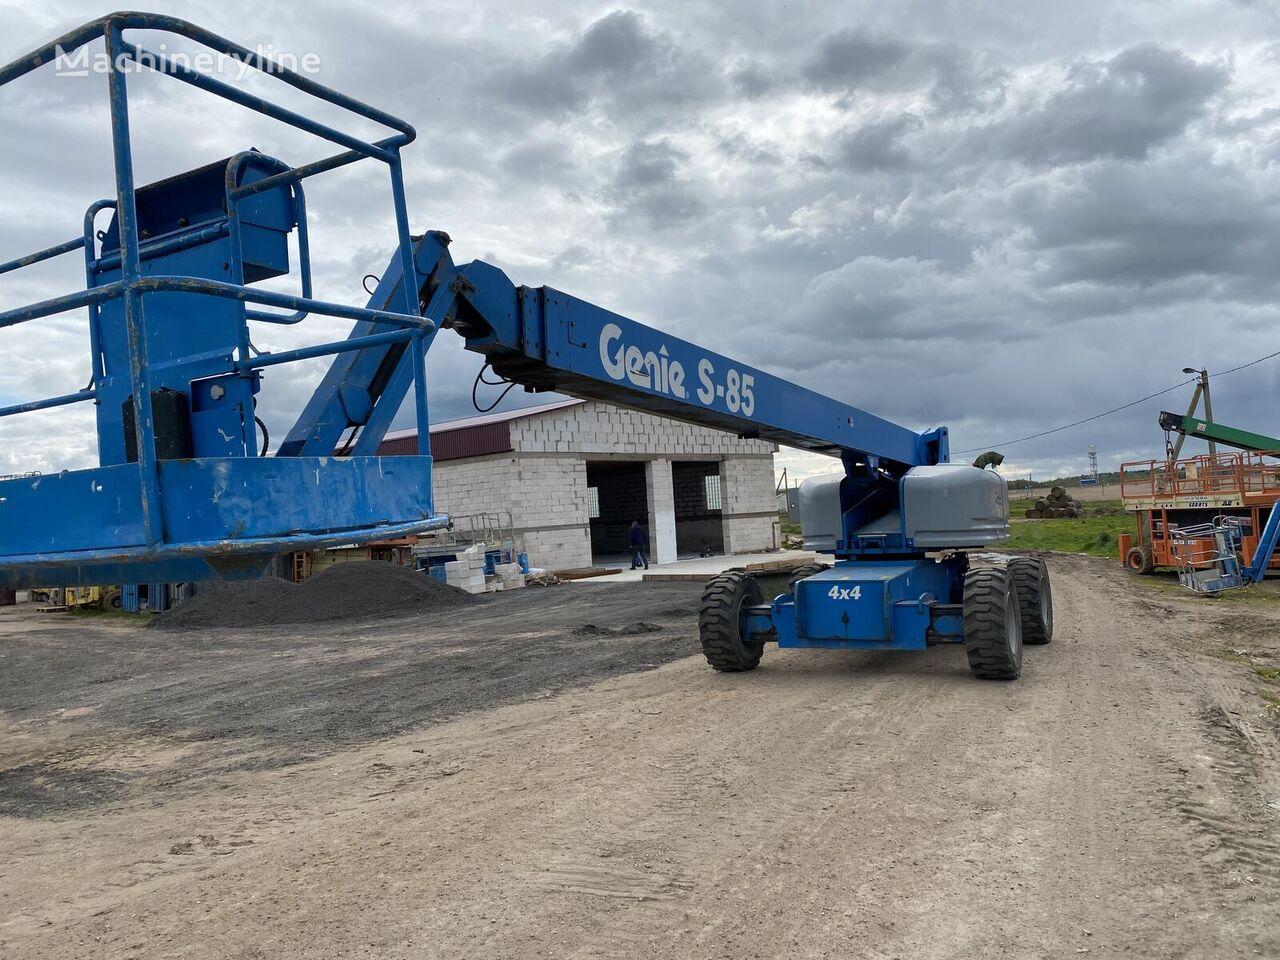 GENIE S85 telescopic boom lift